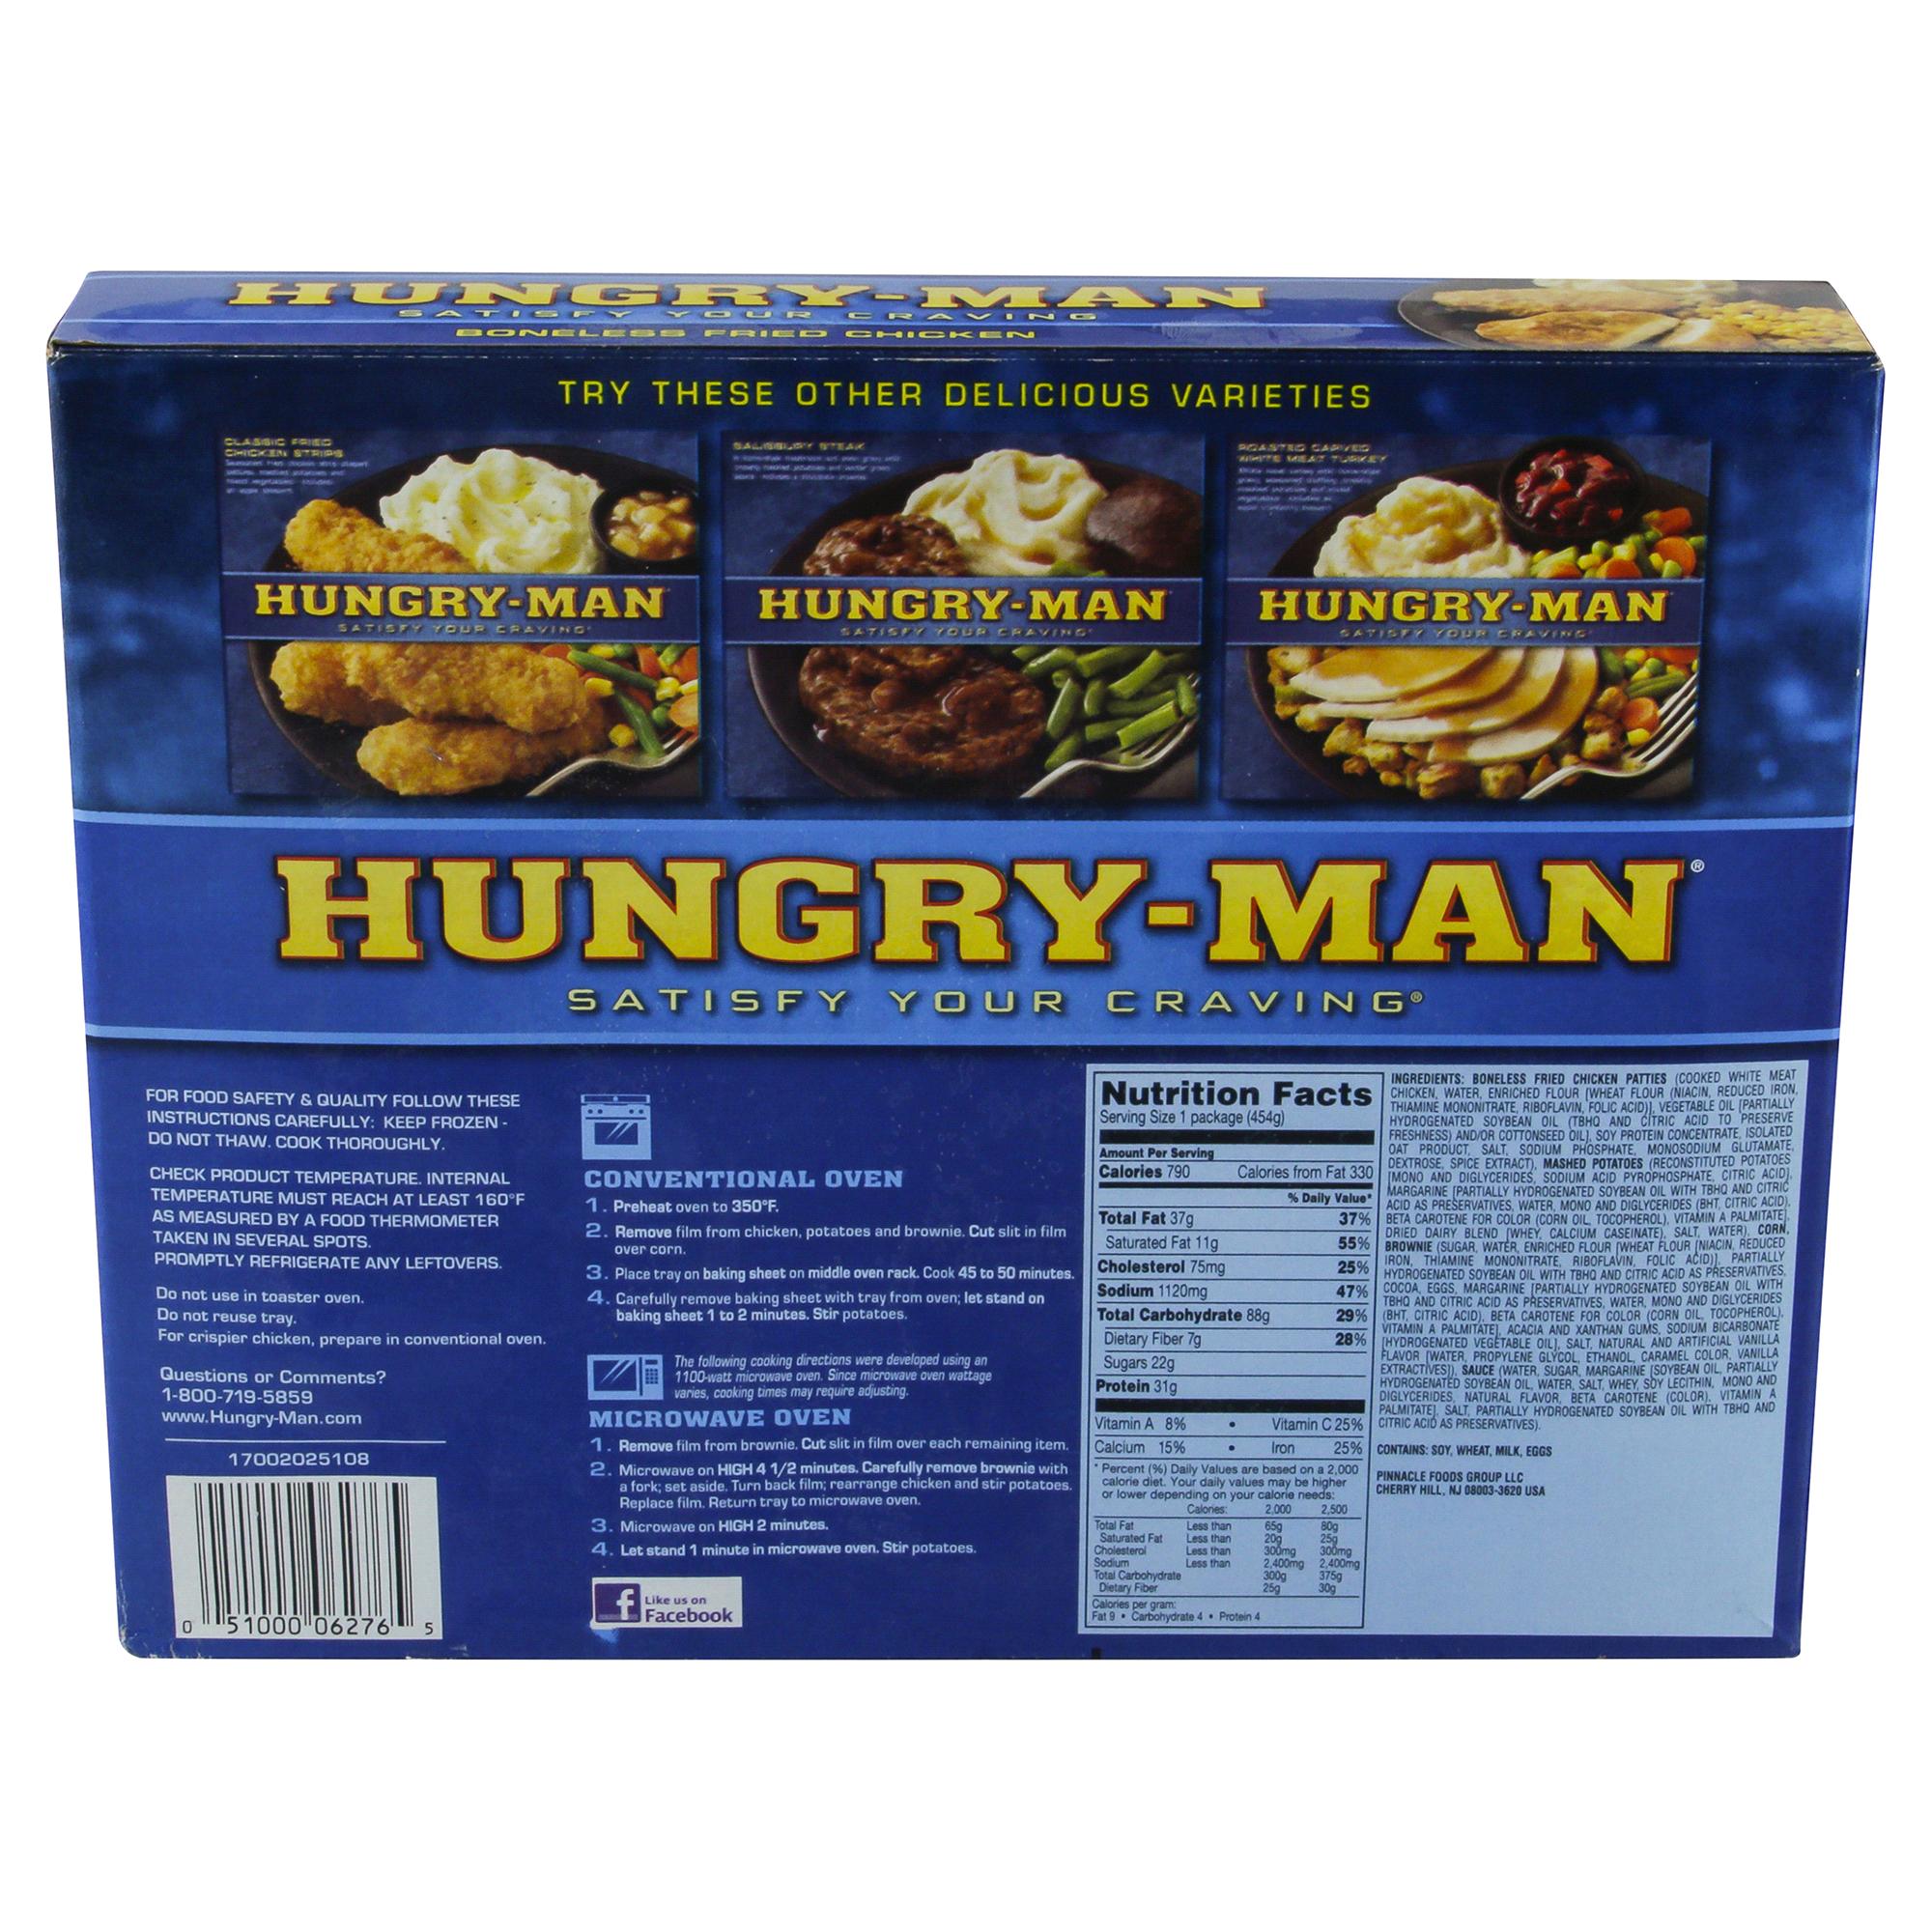 Hungry-Man Boneless Fried Chicken - 16 oz Box | Meijer.com